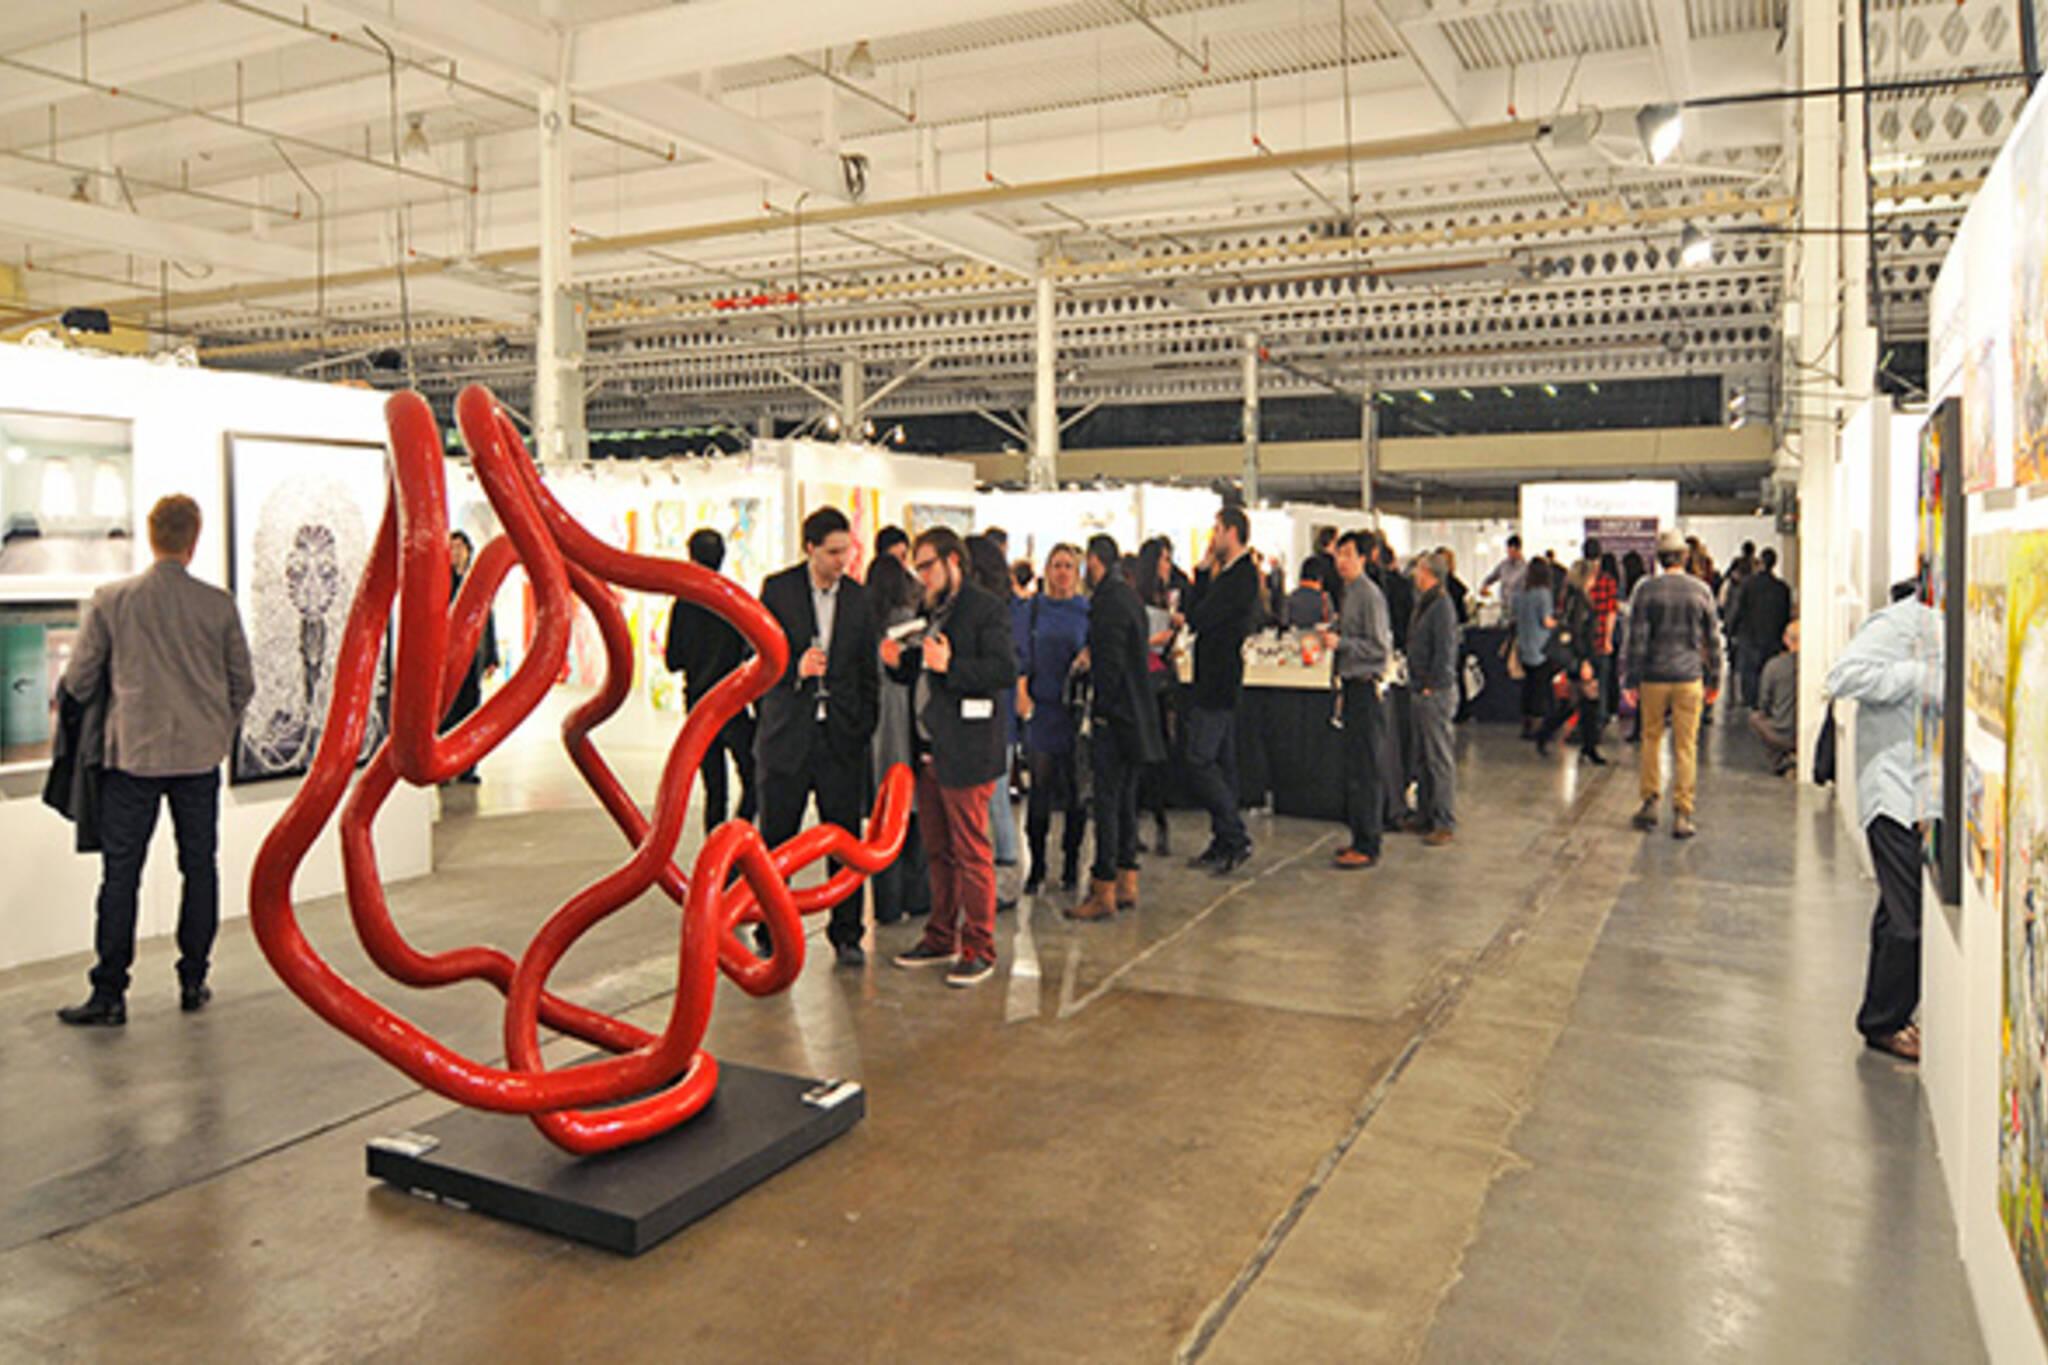 Artist Project Toronto 2014